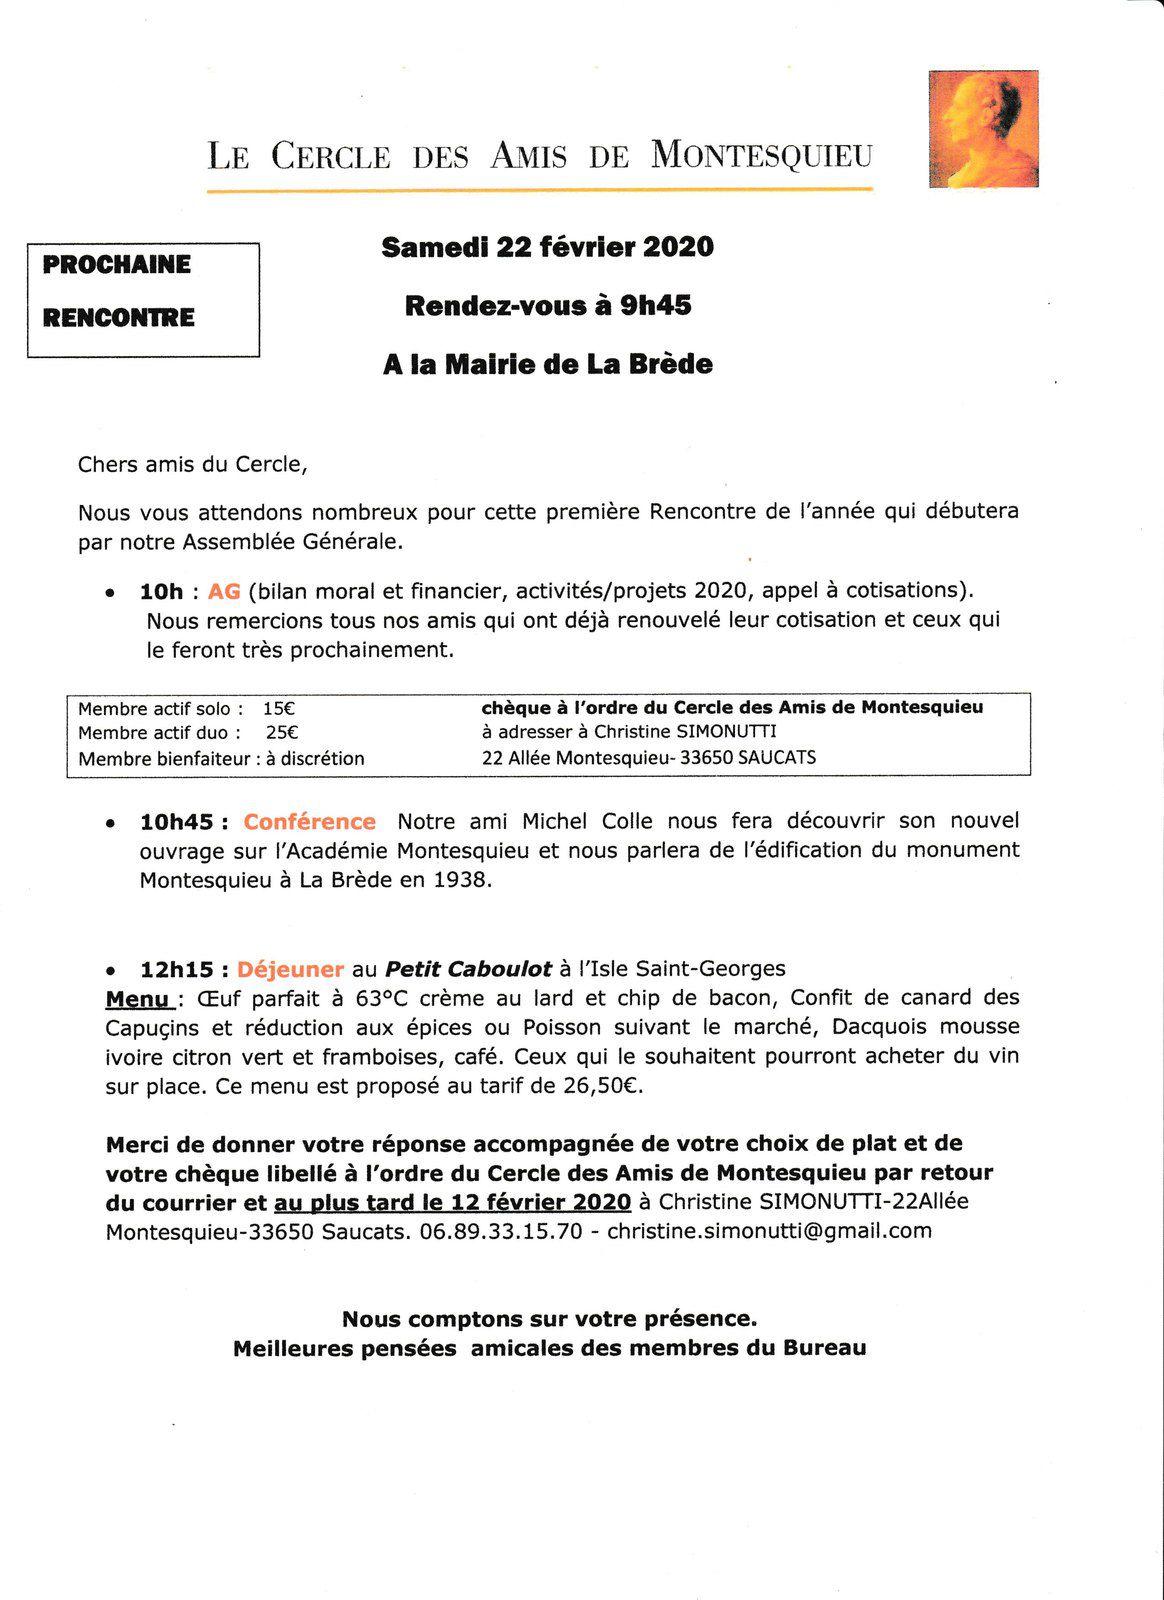 Assemblée Générale : Samedi 22 février 2020